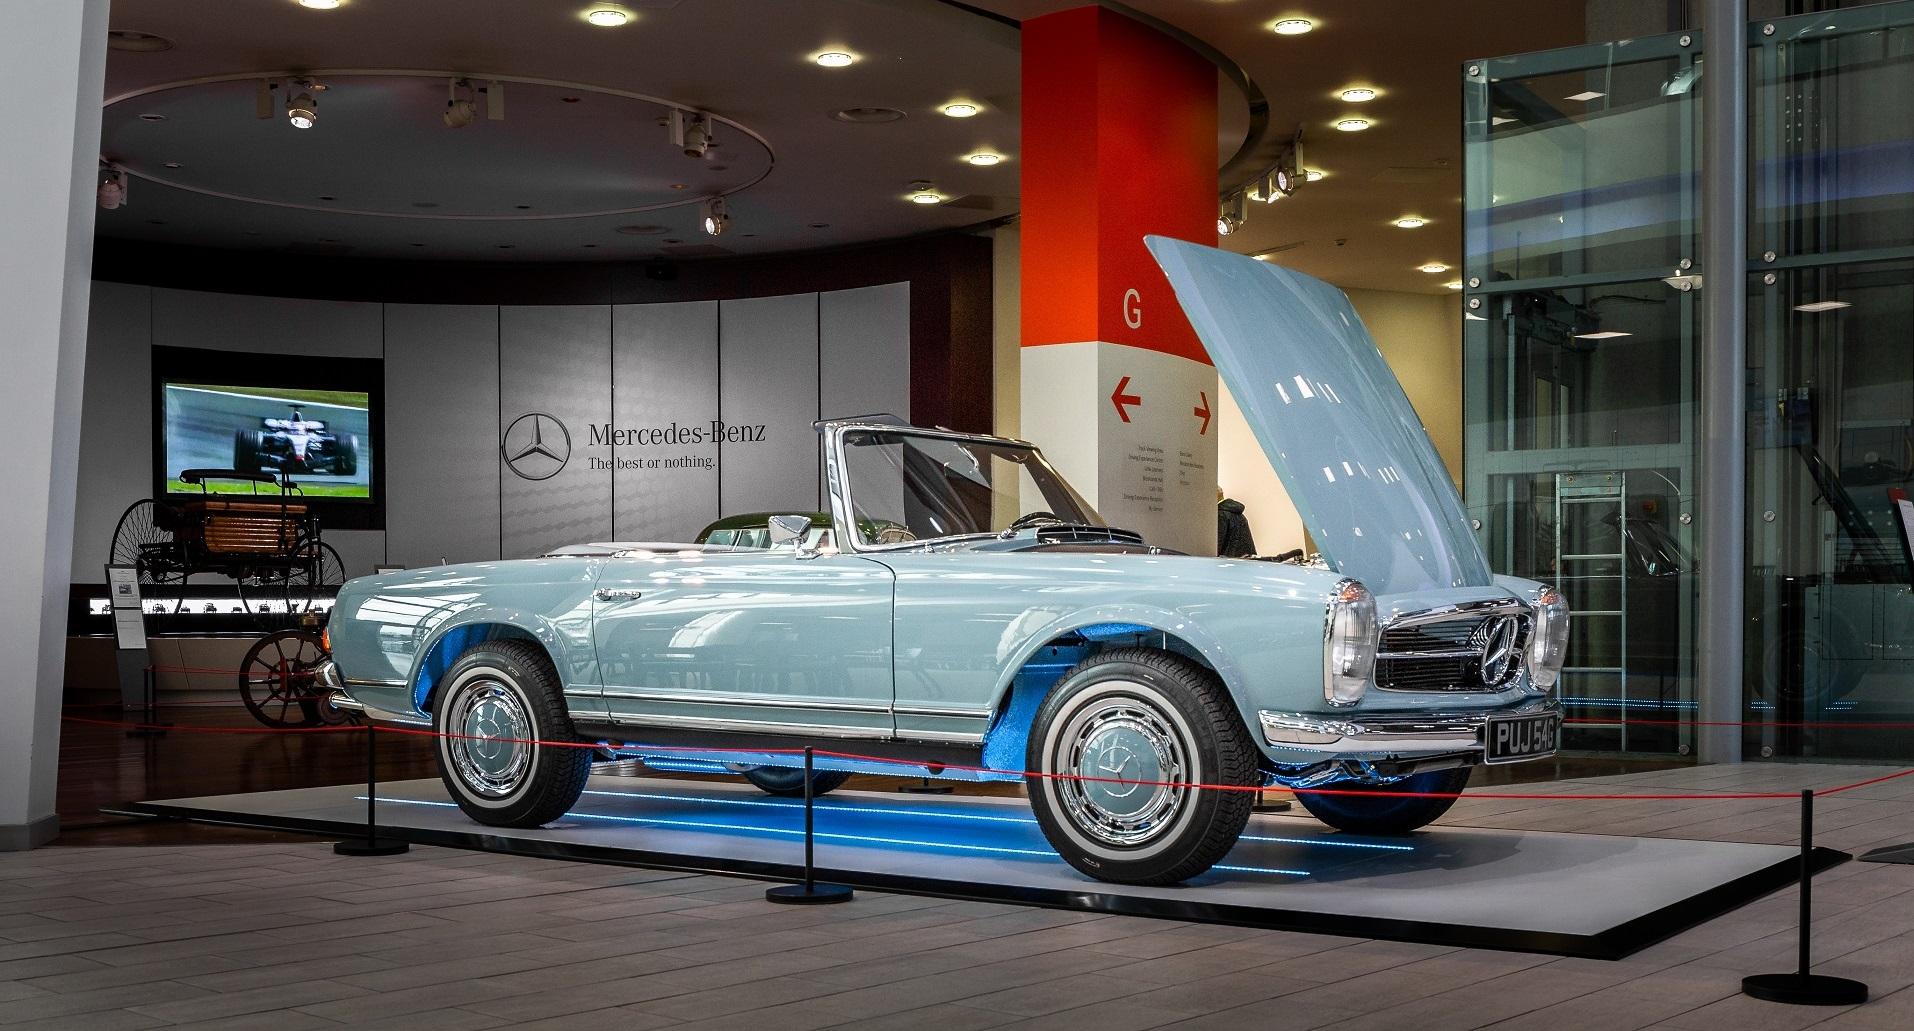 1968 Mercedes-Benz W113 280SL Pagoda in Horizon Blue at Mercedes Benz World Brooklands